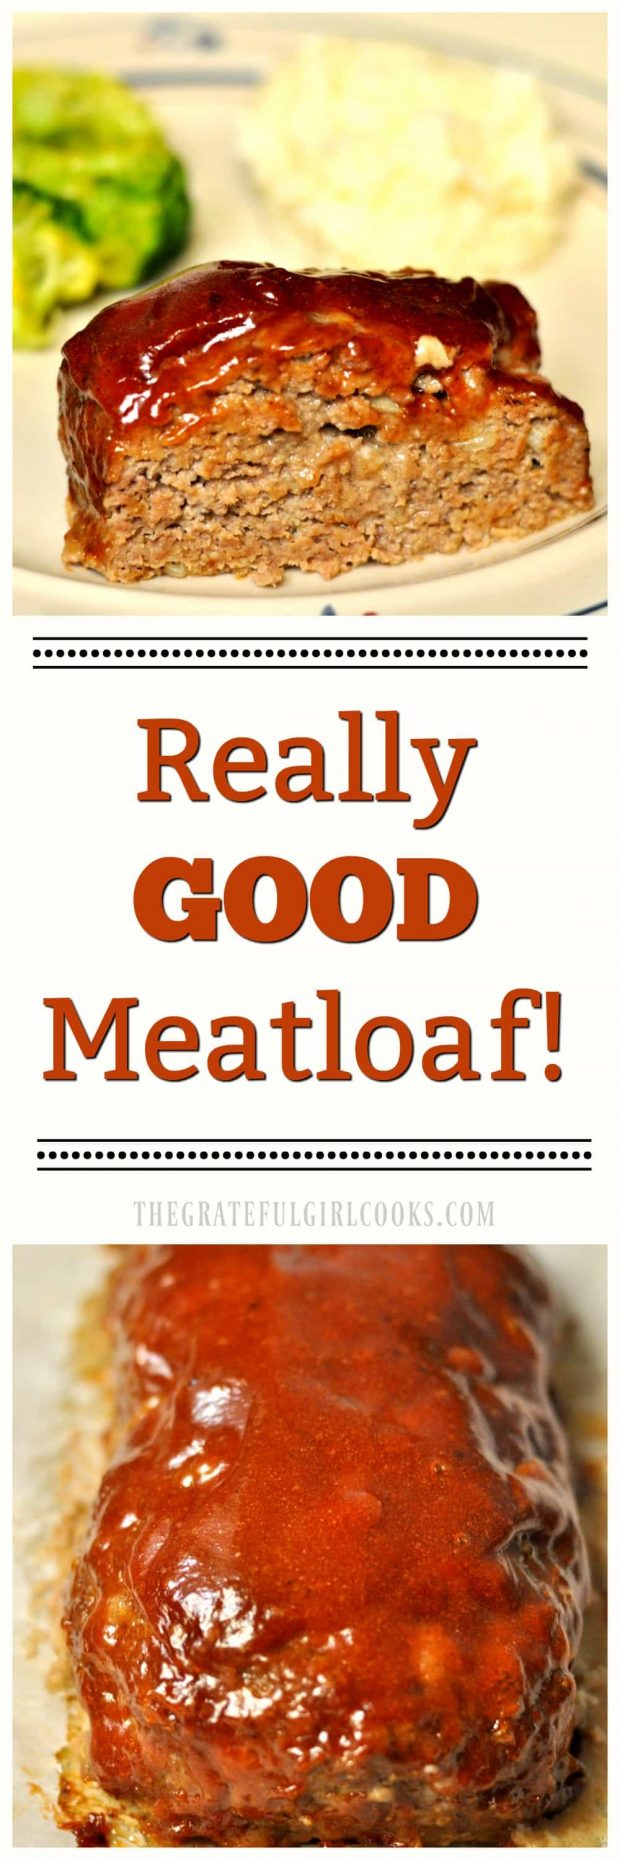 Really GOOD Meatloaf! / The Grateful Girl Cooks!